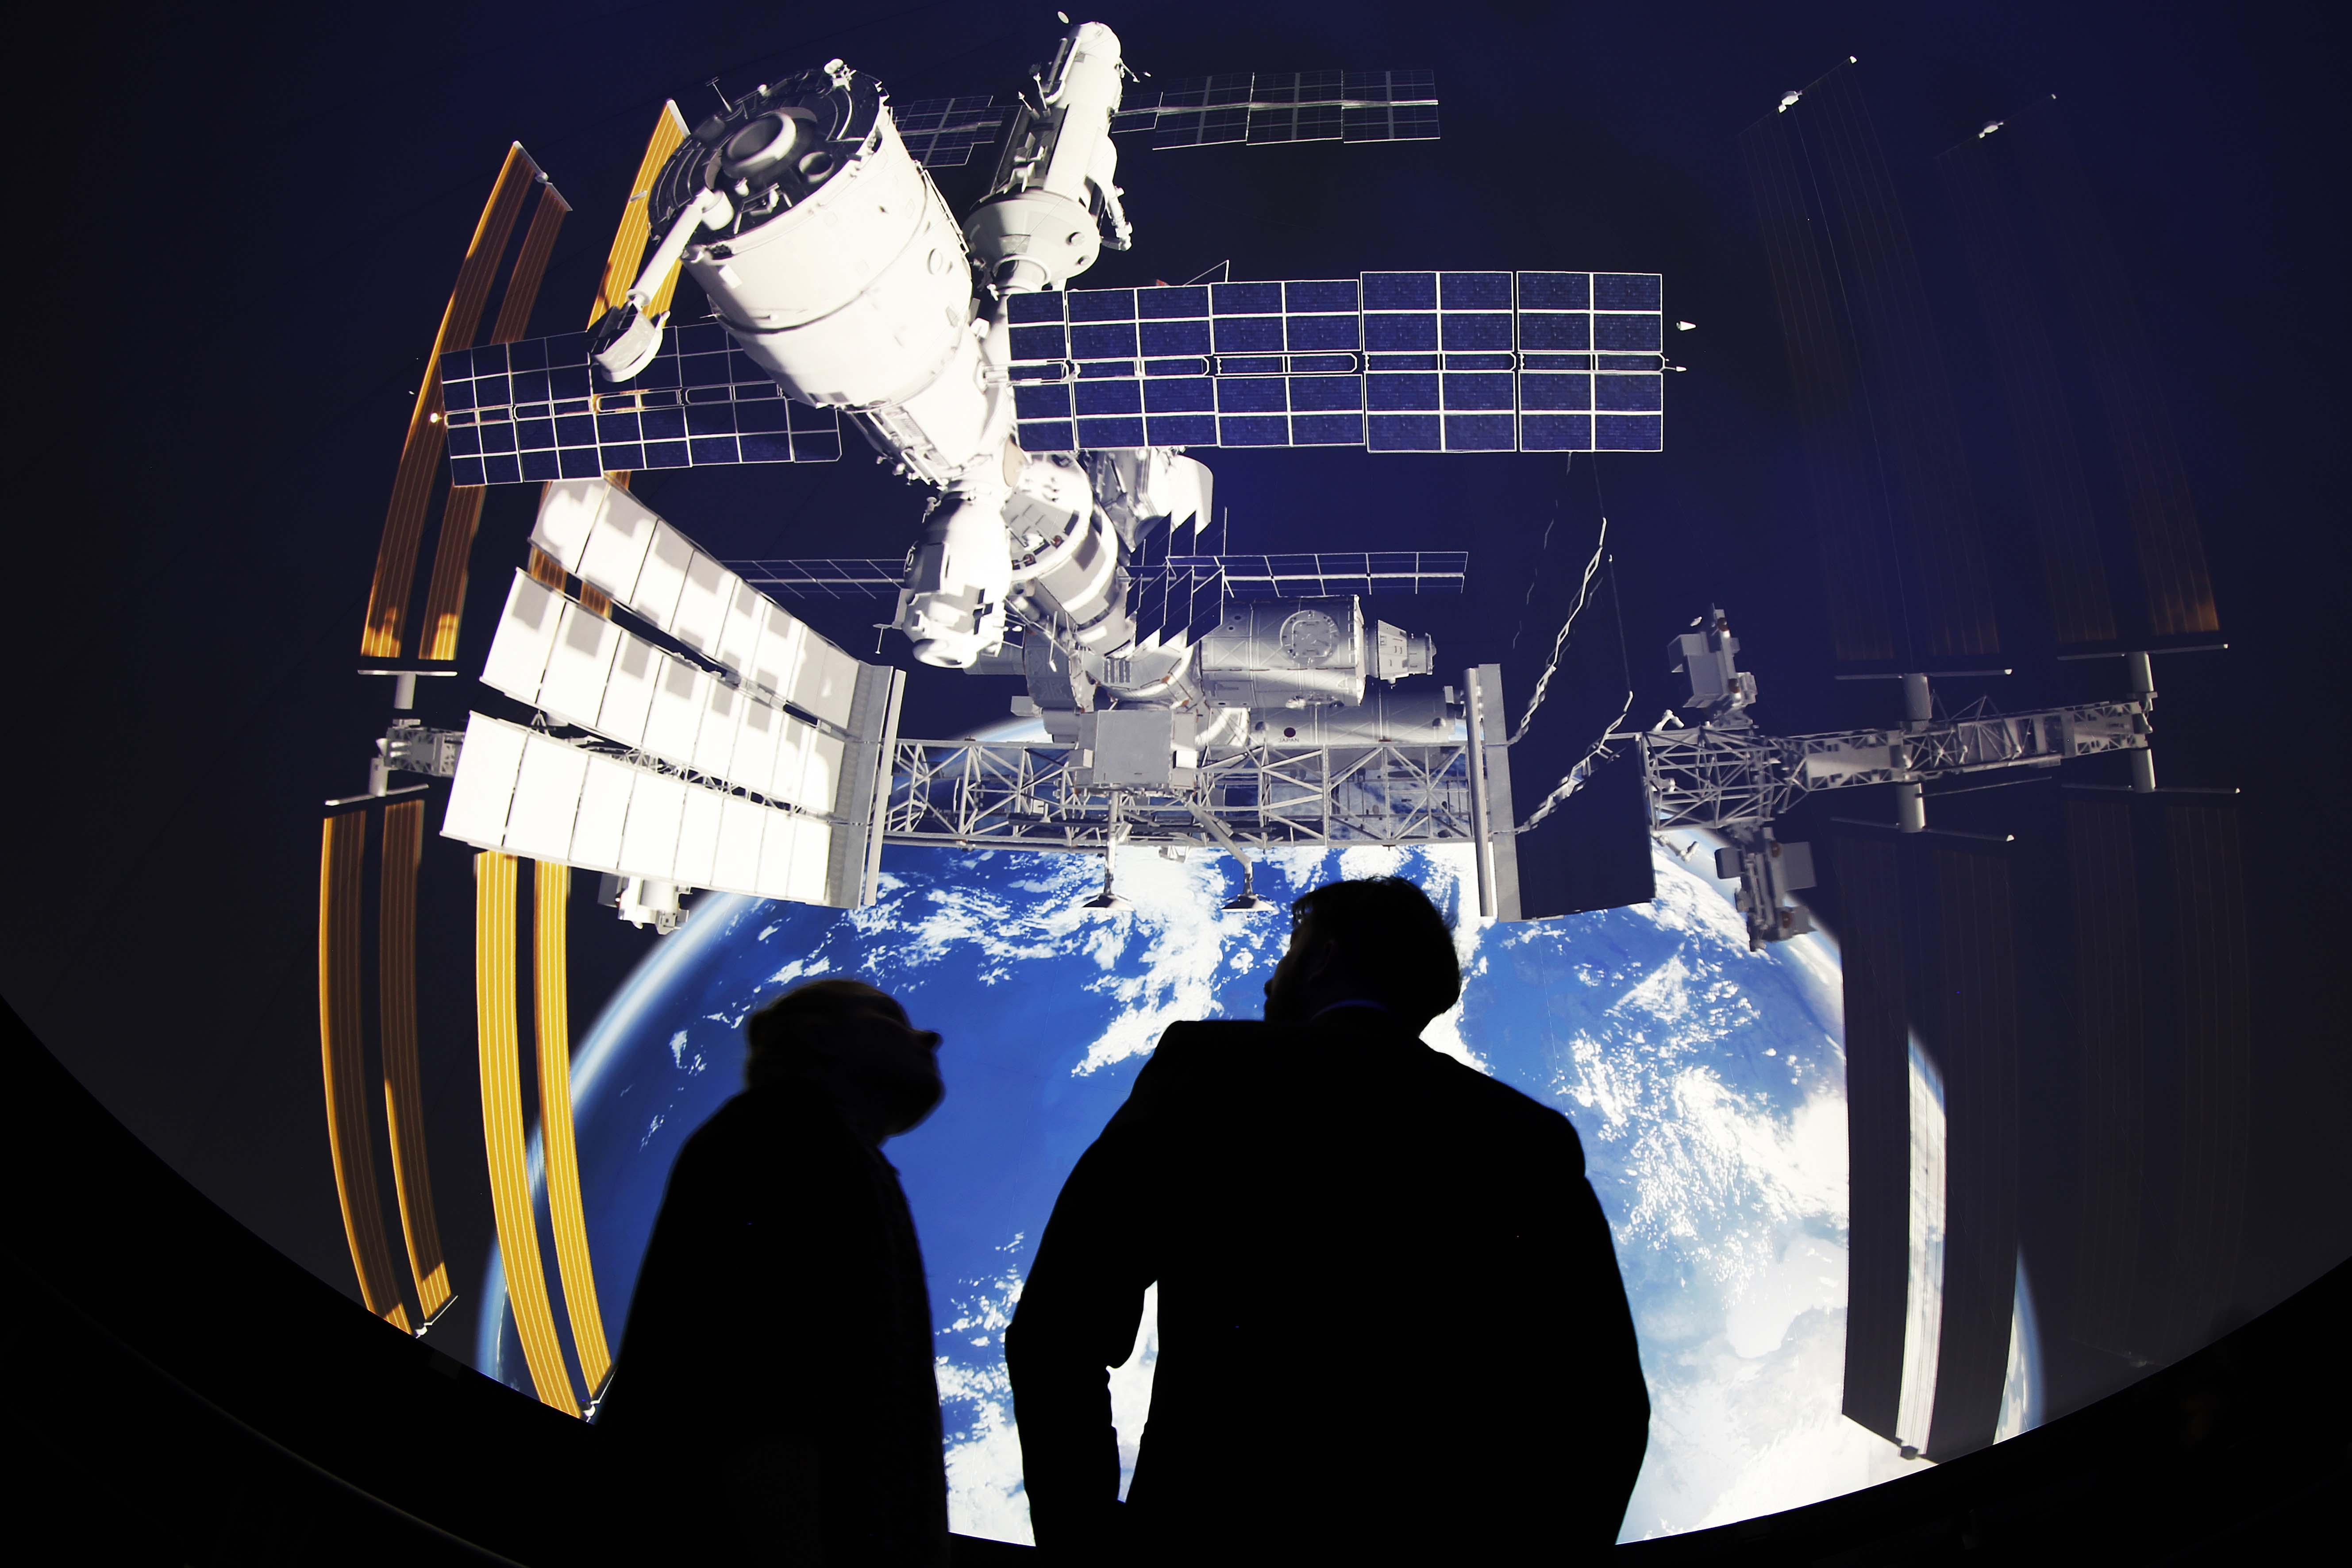 fulldome, kuppelprojektion, immersive,  360°, unesco, infotainment, carl zeiss ag, deutsches museum, munich, muenchen, visuarte